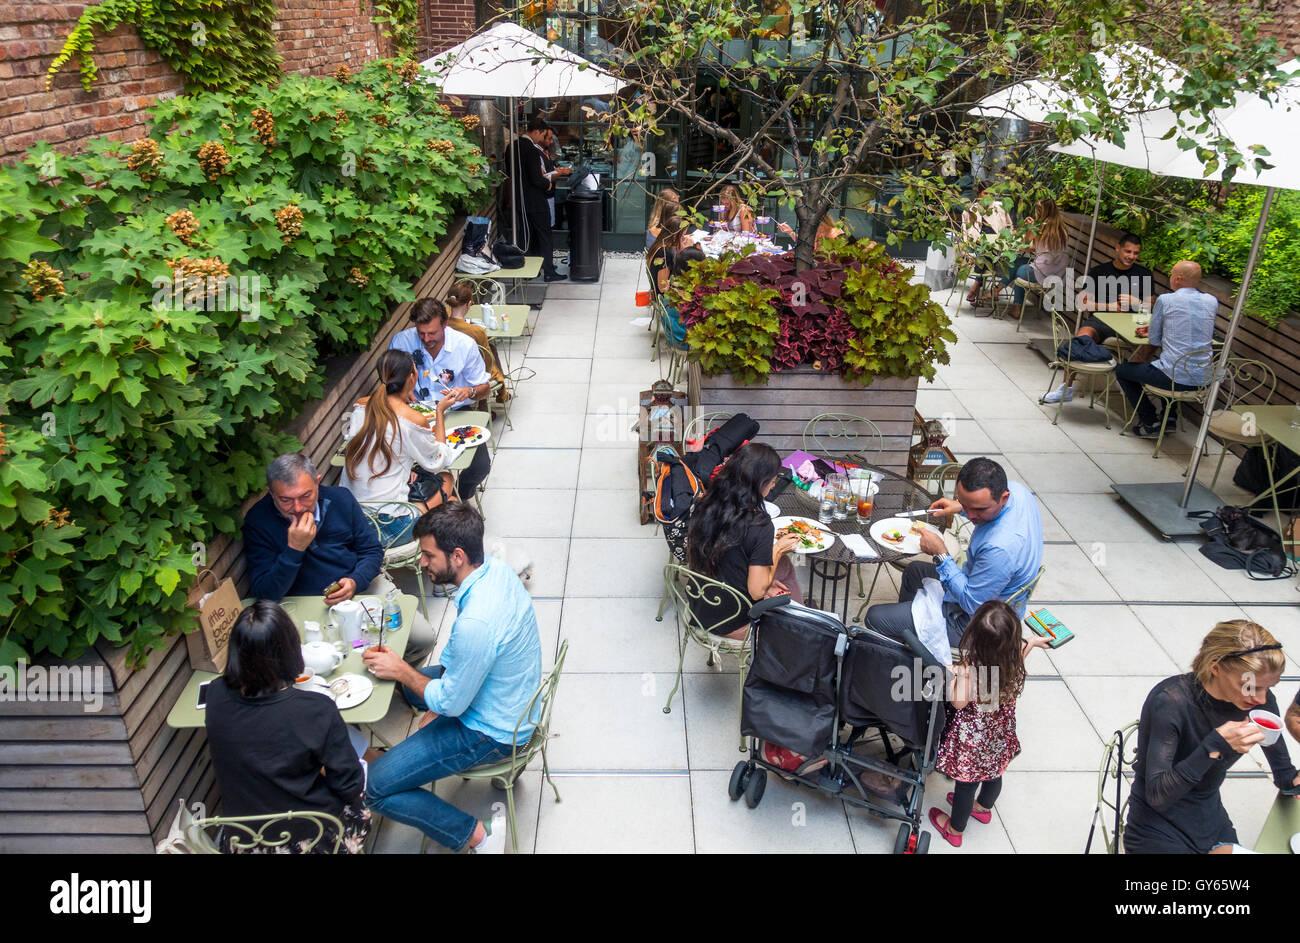 Diners enjoying a garden restaurant setting in Lower Manhattan - Stock Image